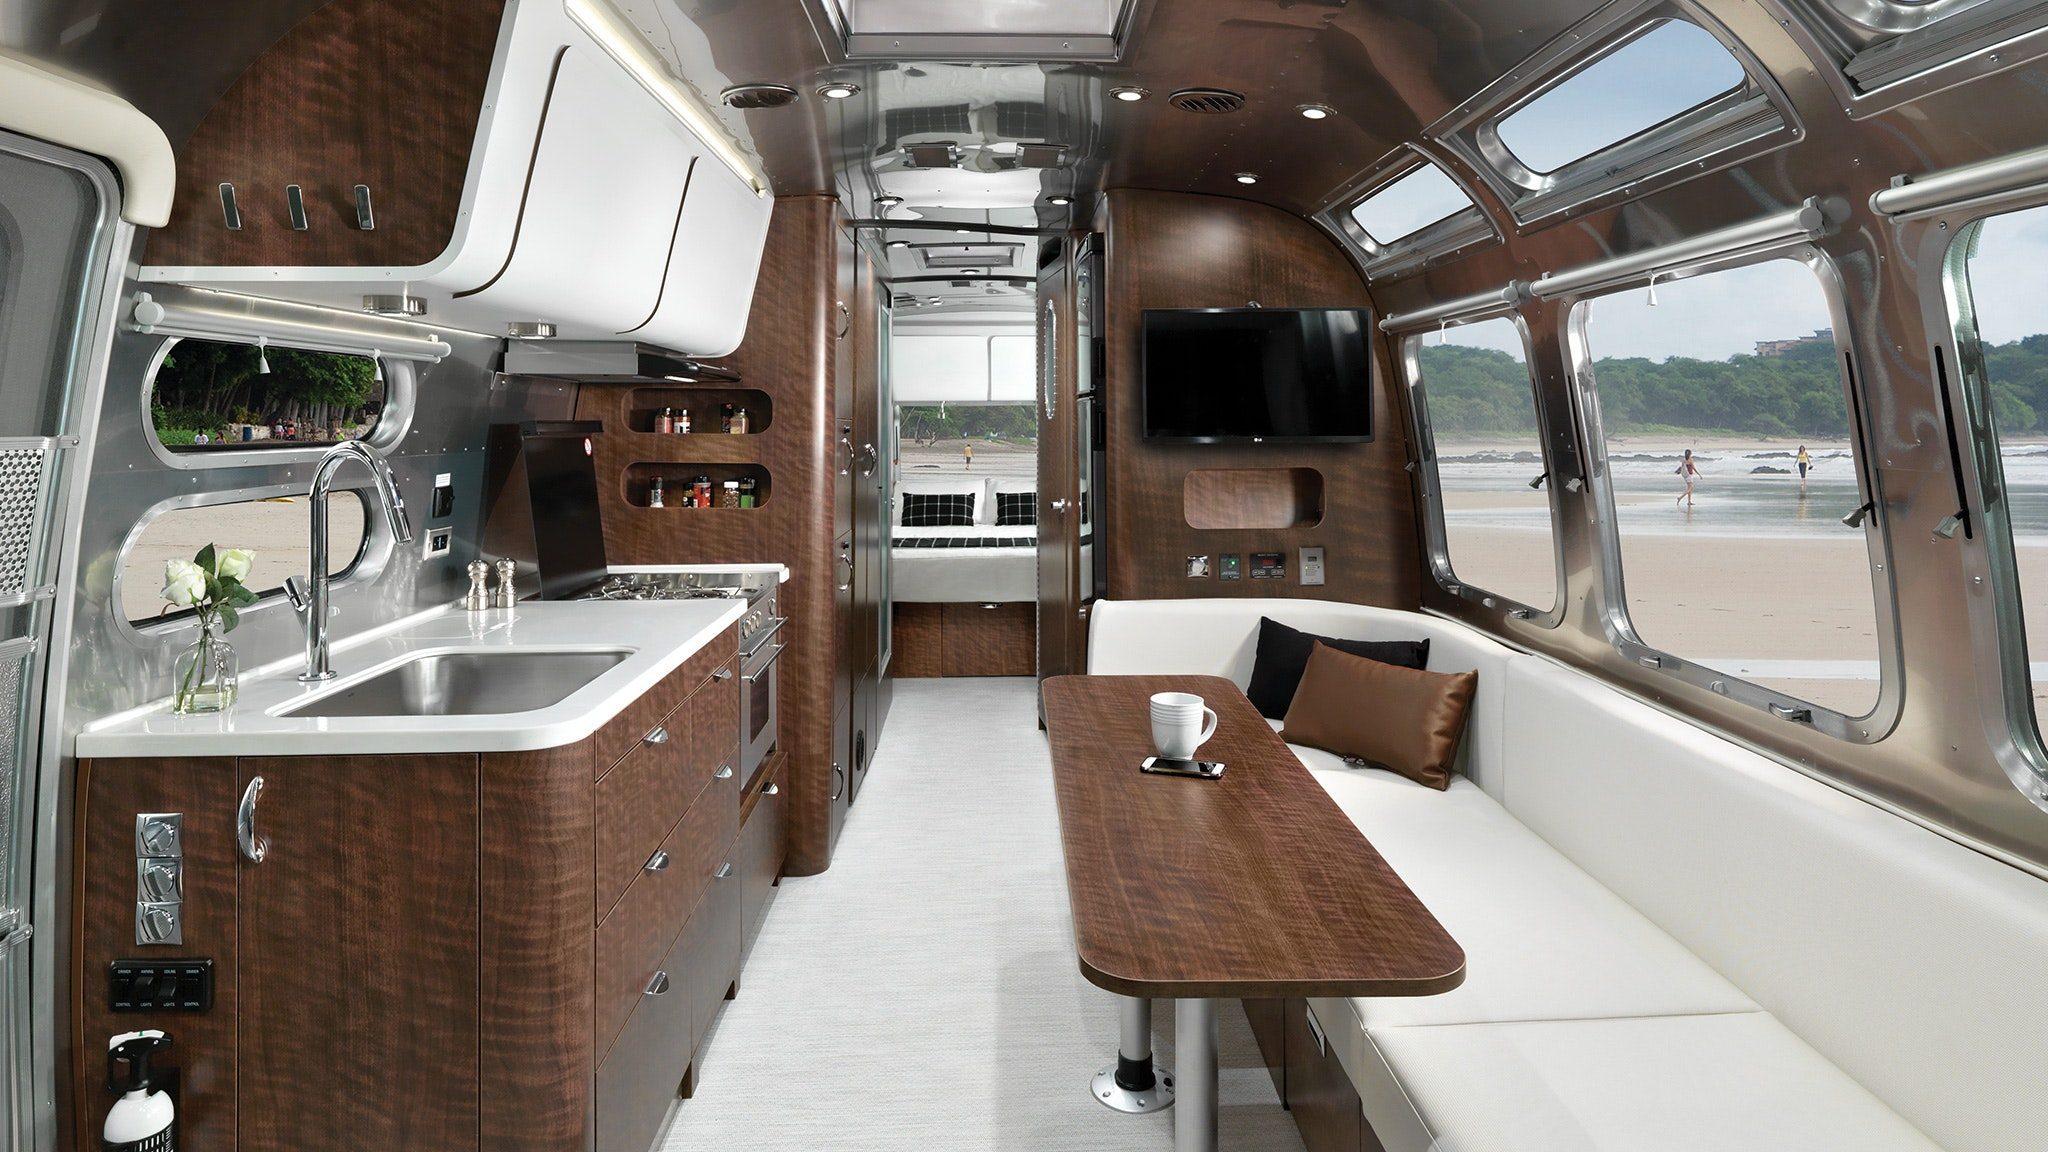 airsteam-globetrotter-30rbq-interior